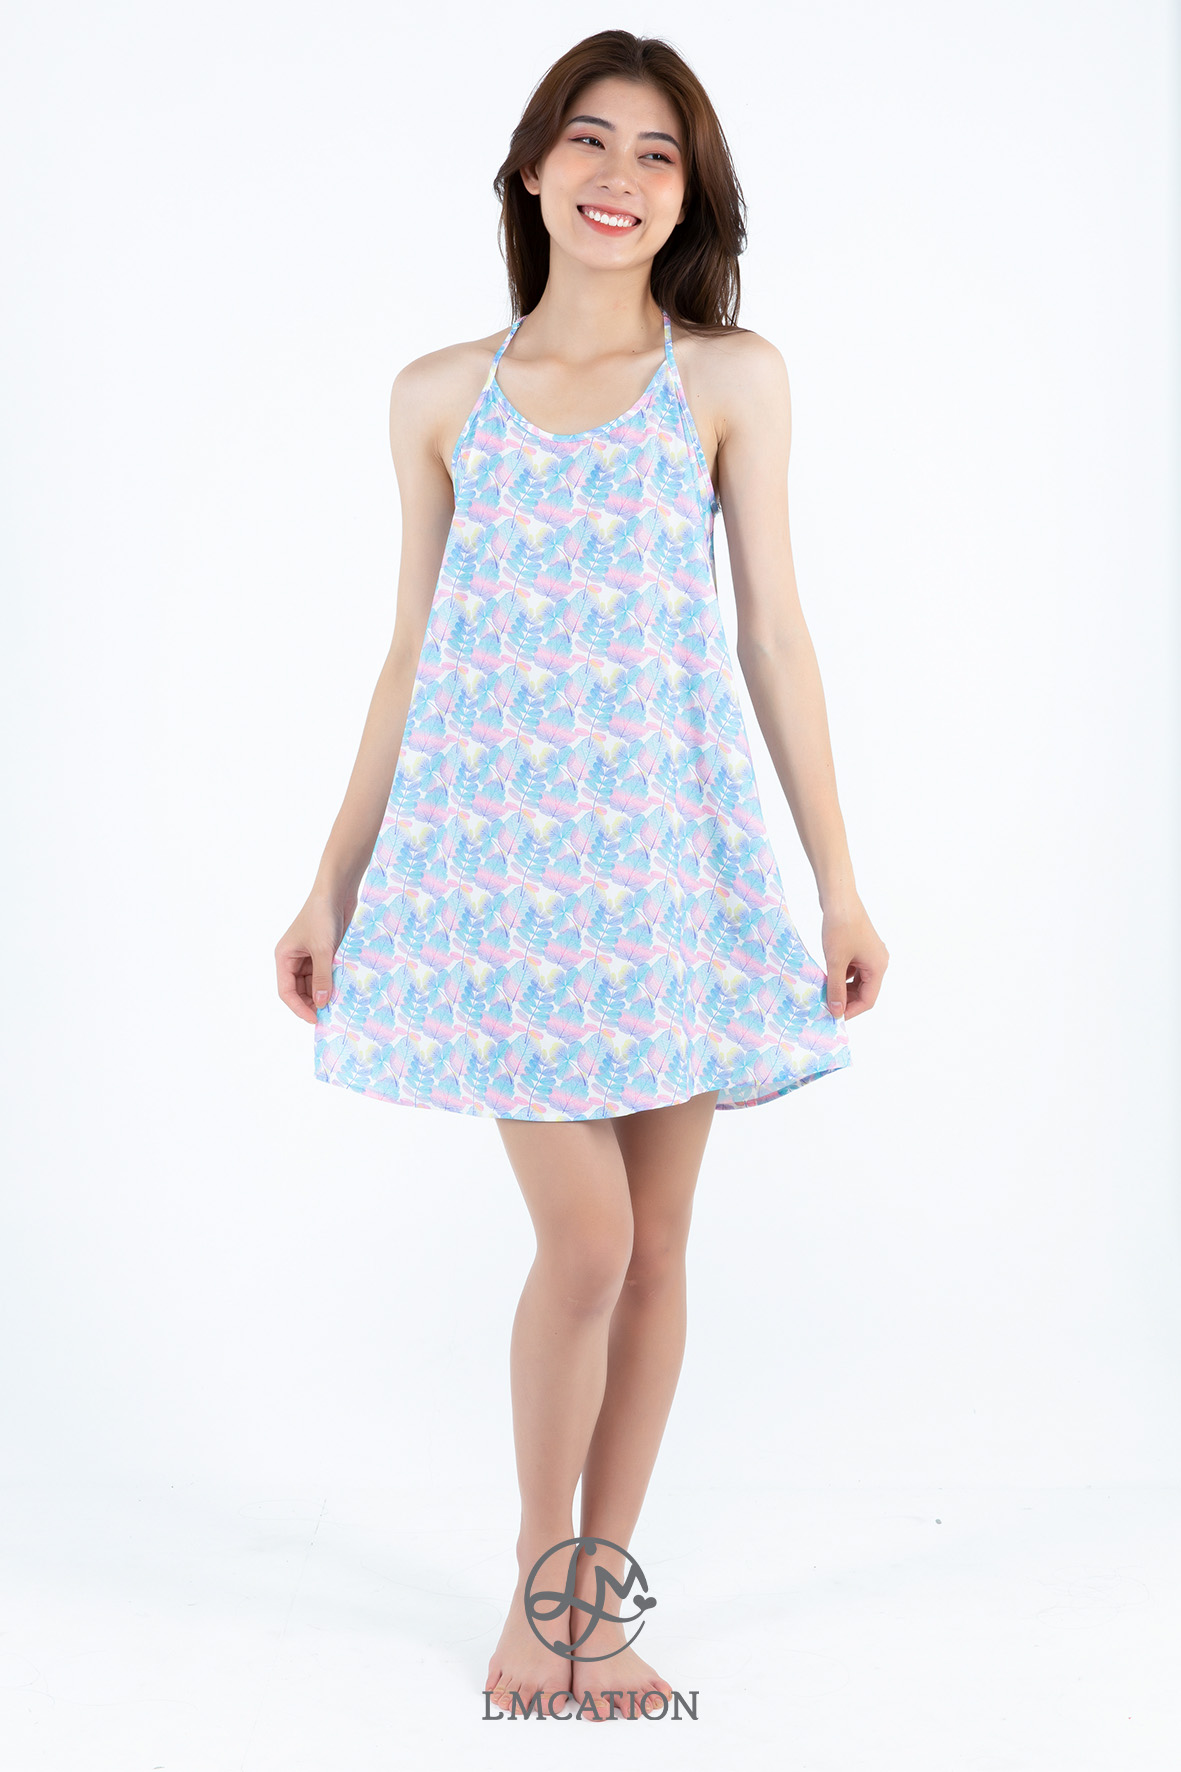 LMcation Vada Dress - Pastel Leaves